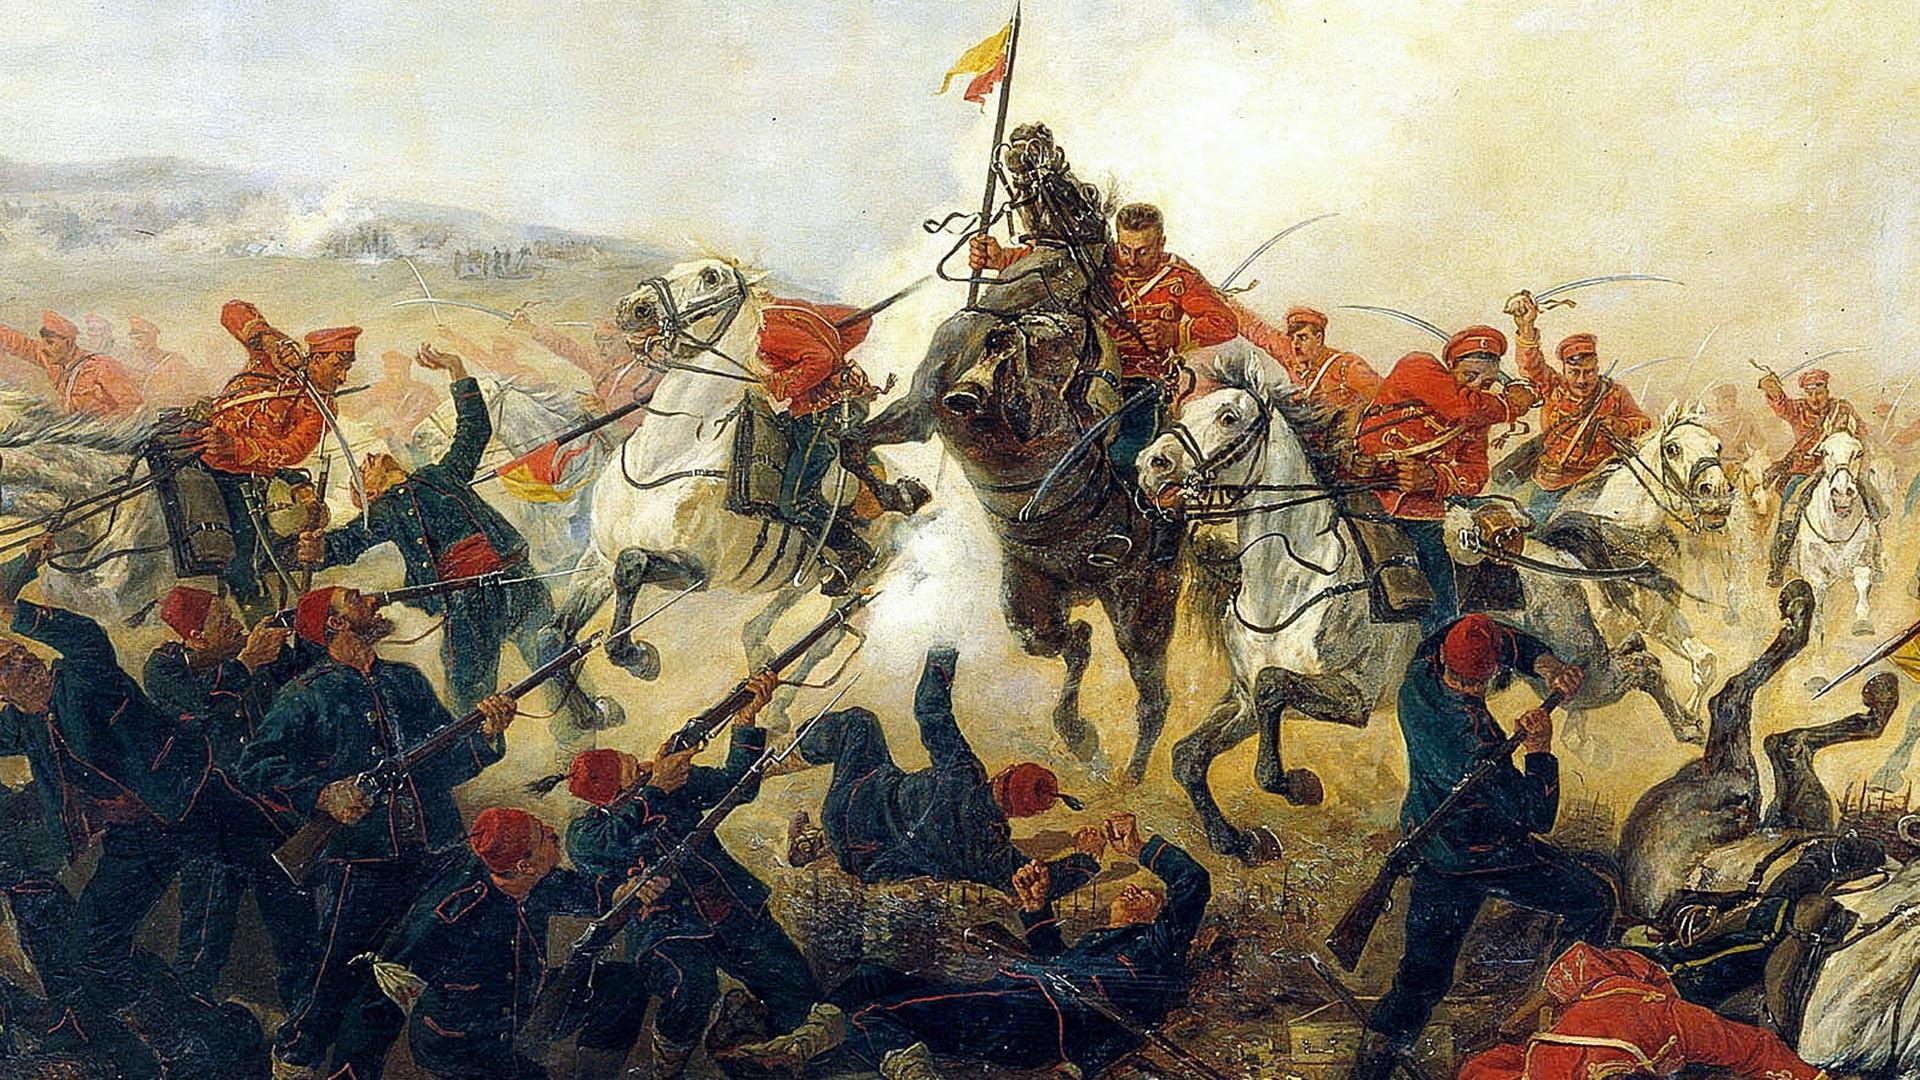 Guerre russo-turque de 1877-1878